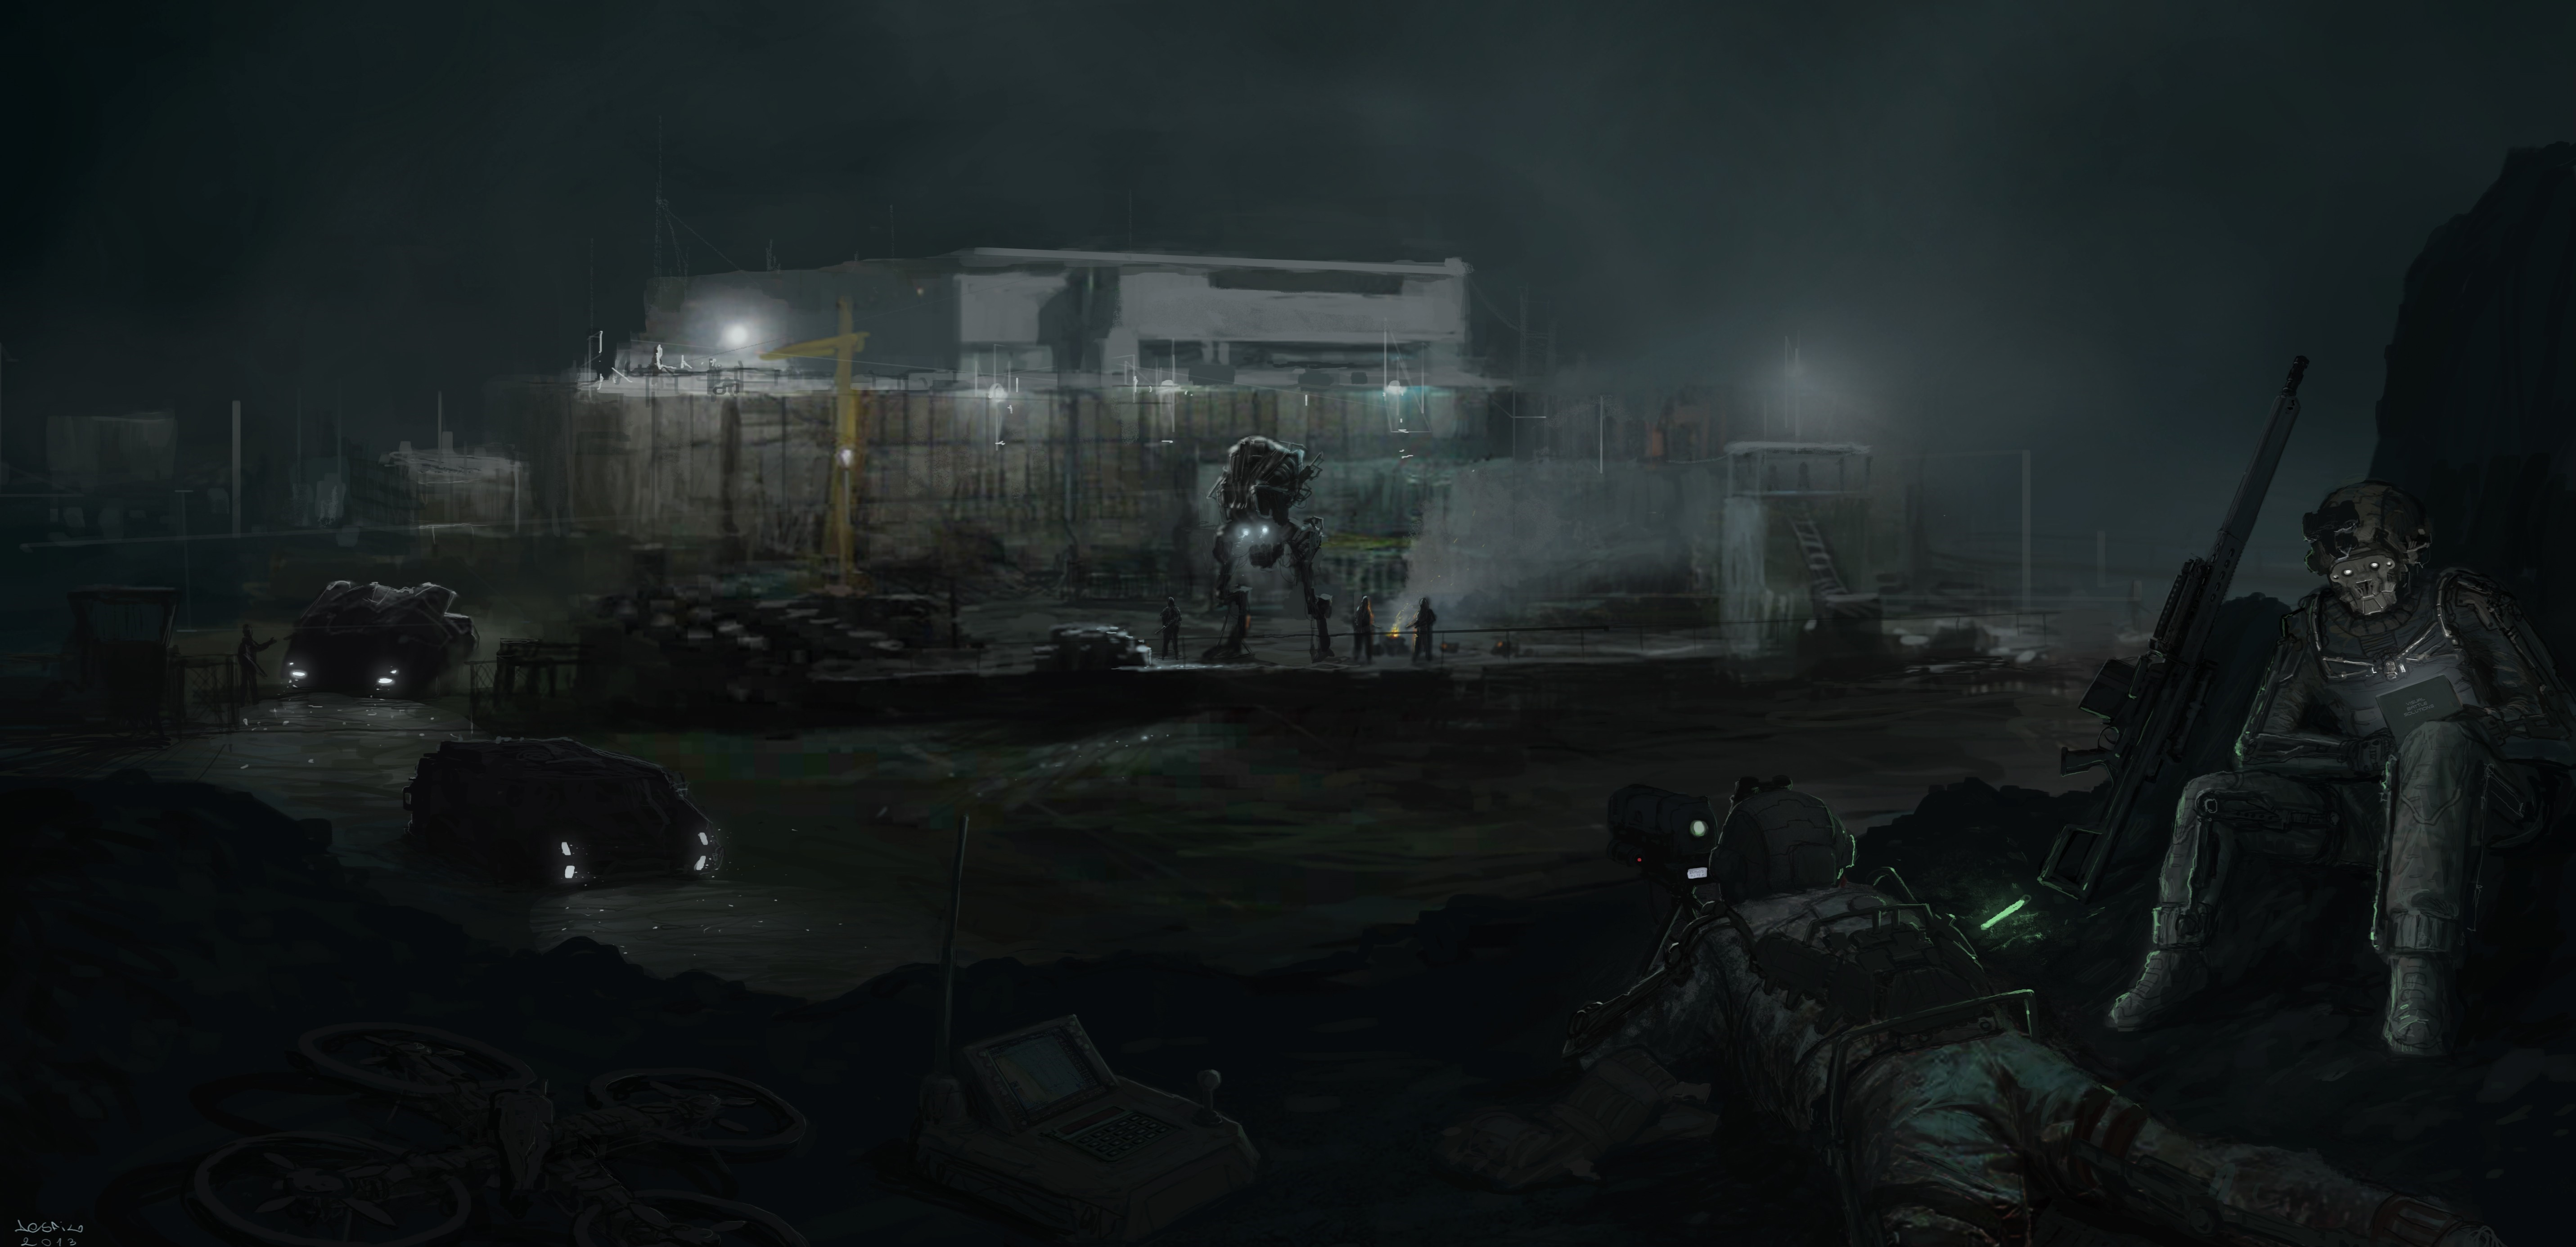 dark science fiction futuristic 2013 (year) artwork